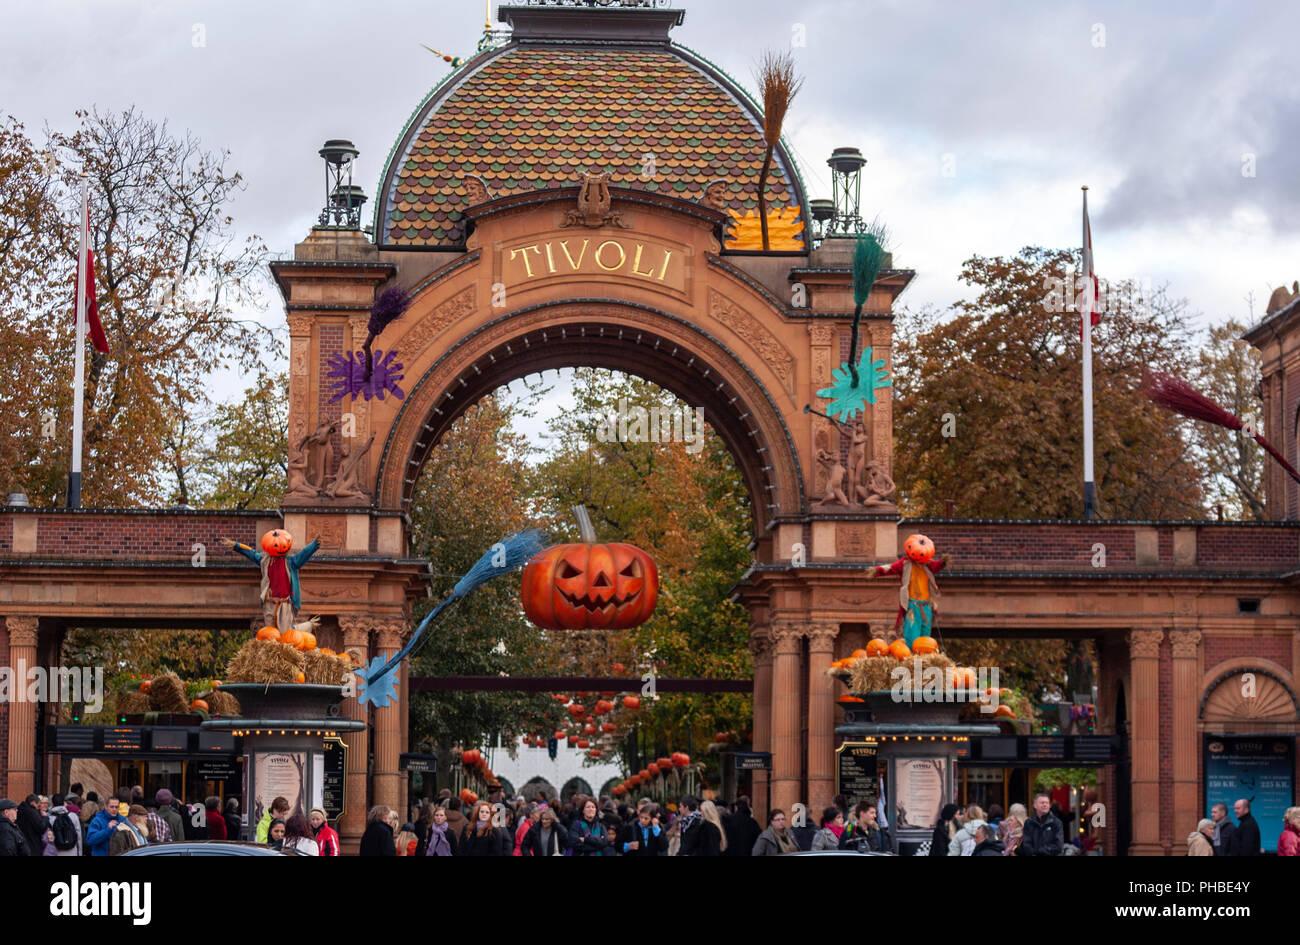 Jack o lantern halloween nel parco divertimenti giardini di tivoli e